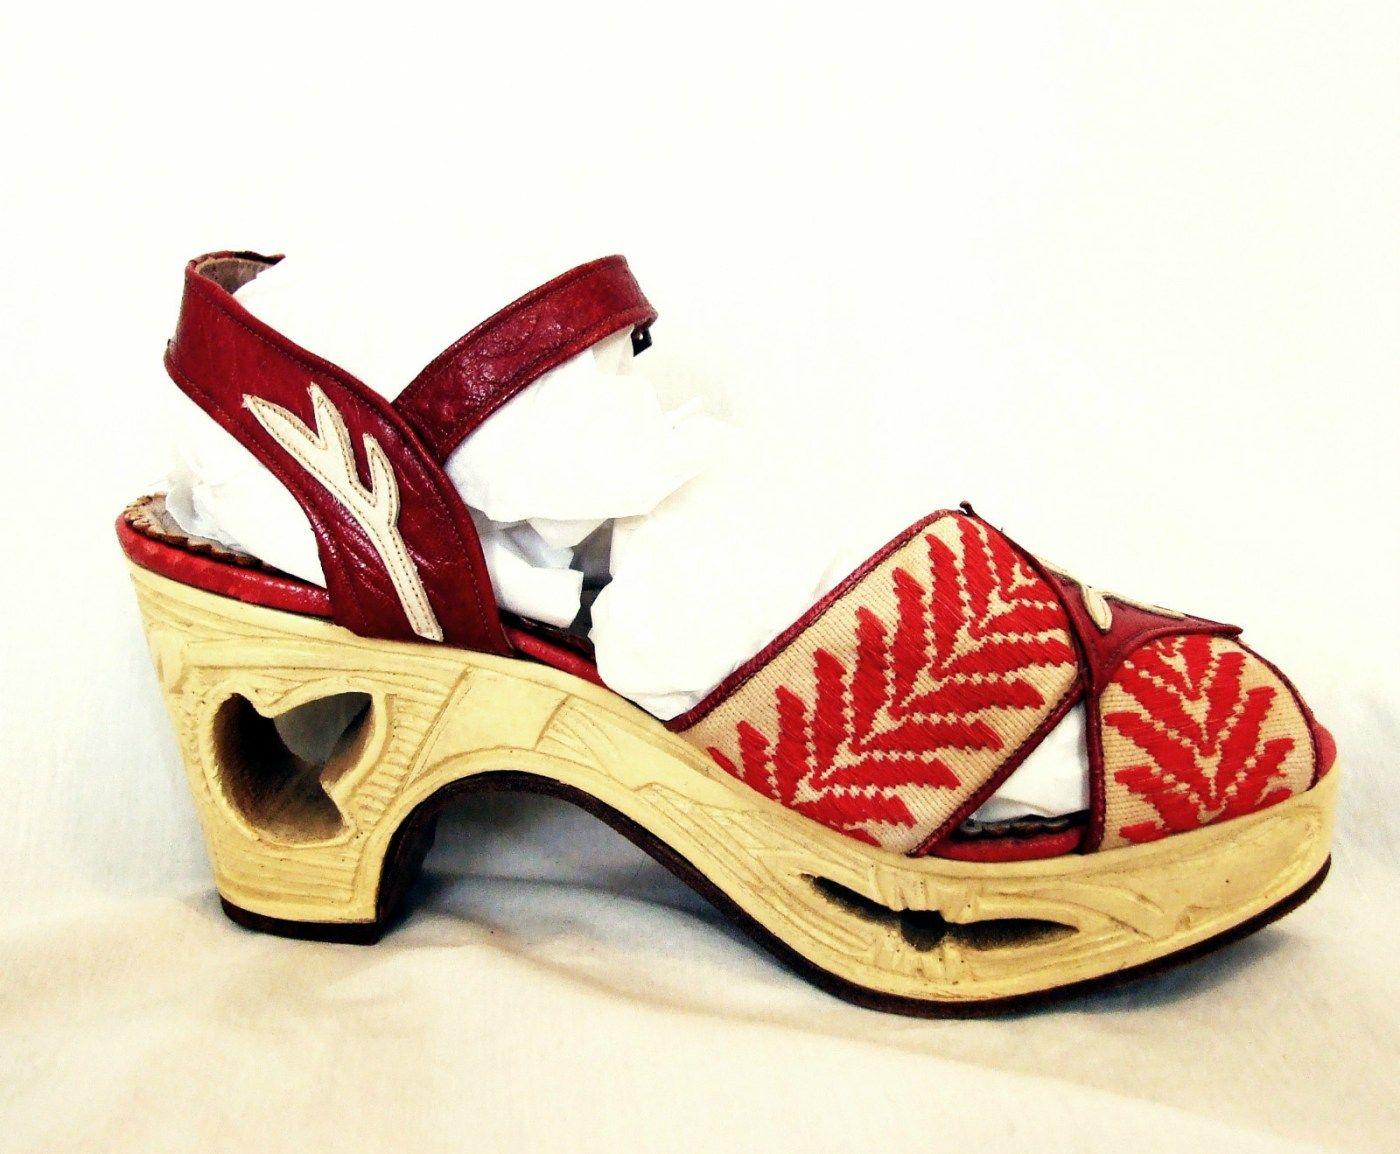 1940s WWII Carved Platform Heels | Swing Era Shoes